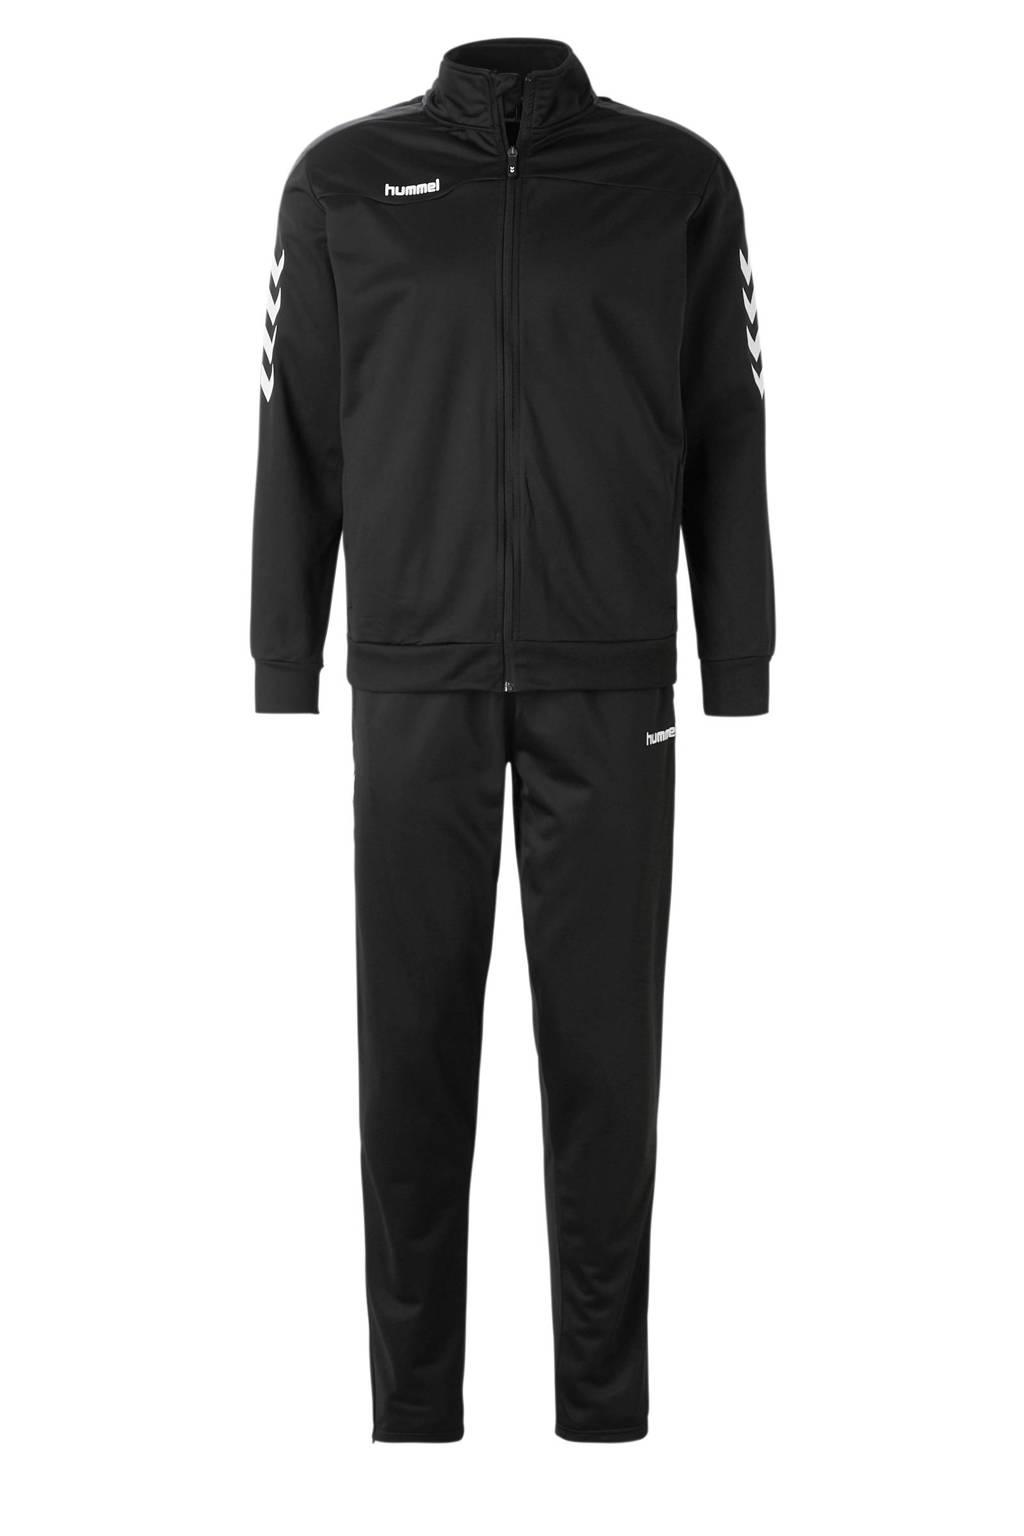 hummel   Valencia trainingspak zwart, Zwart/wit, Heren